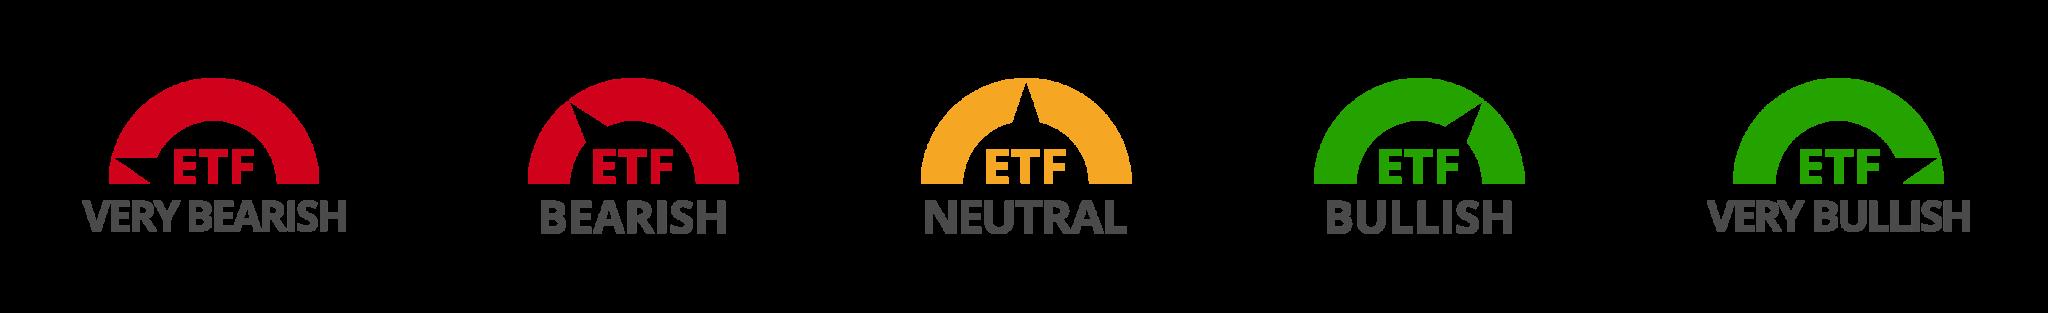 ETF Power Gauge Rating